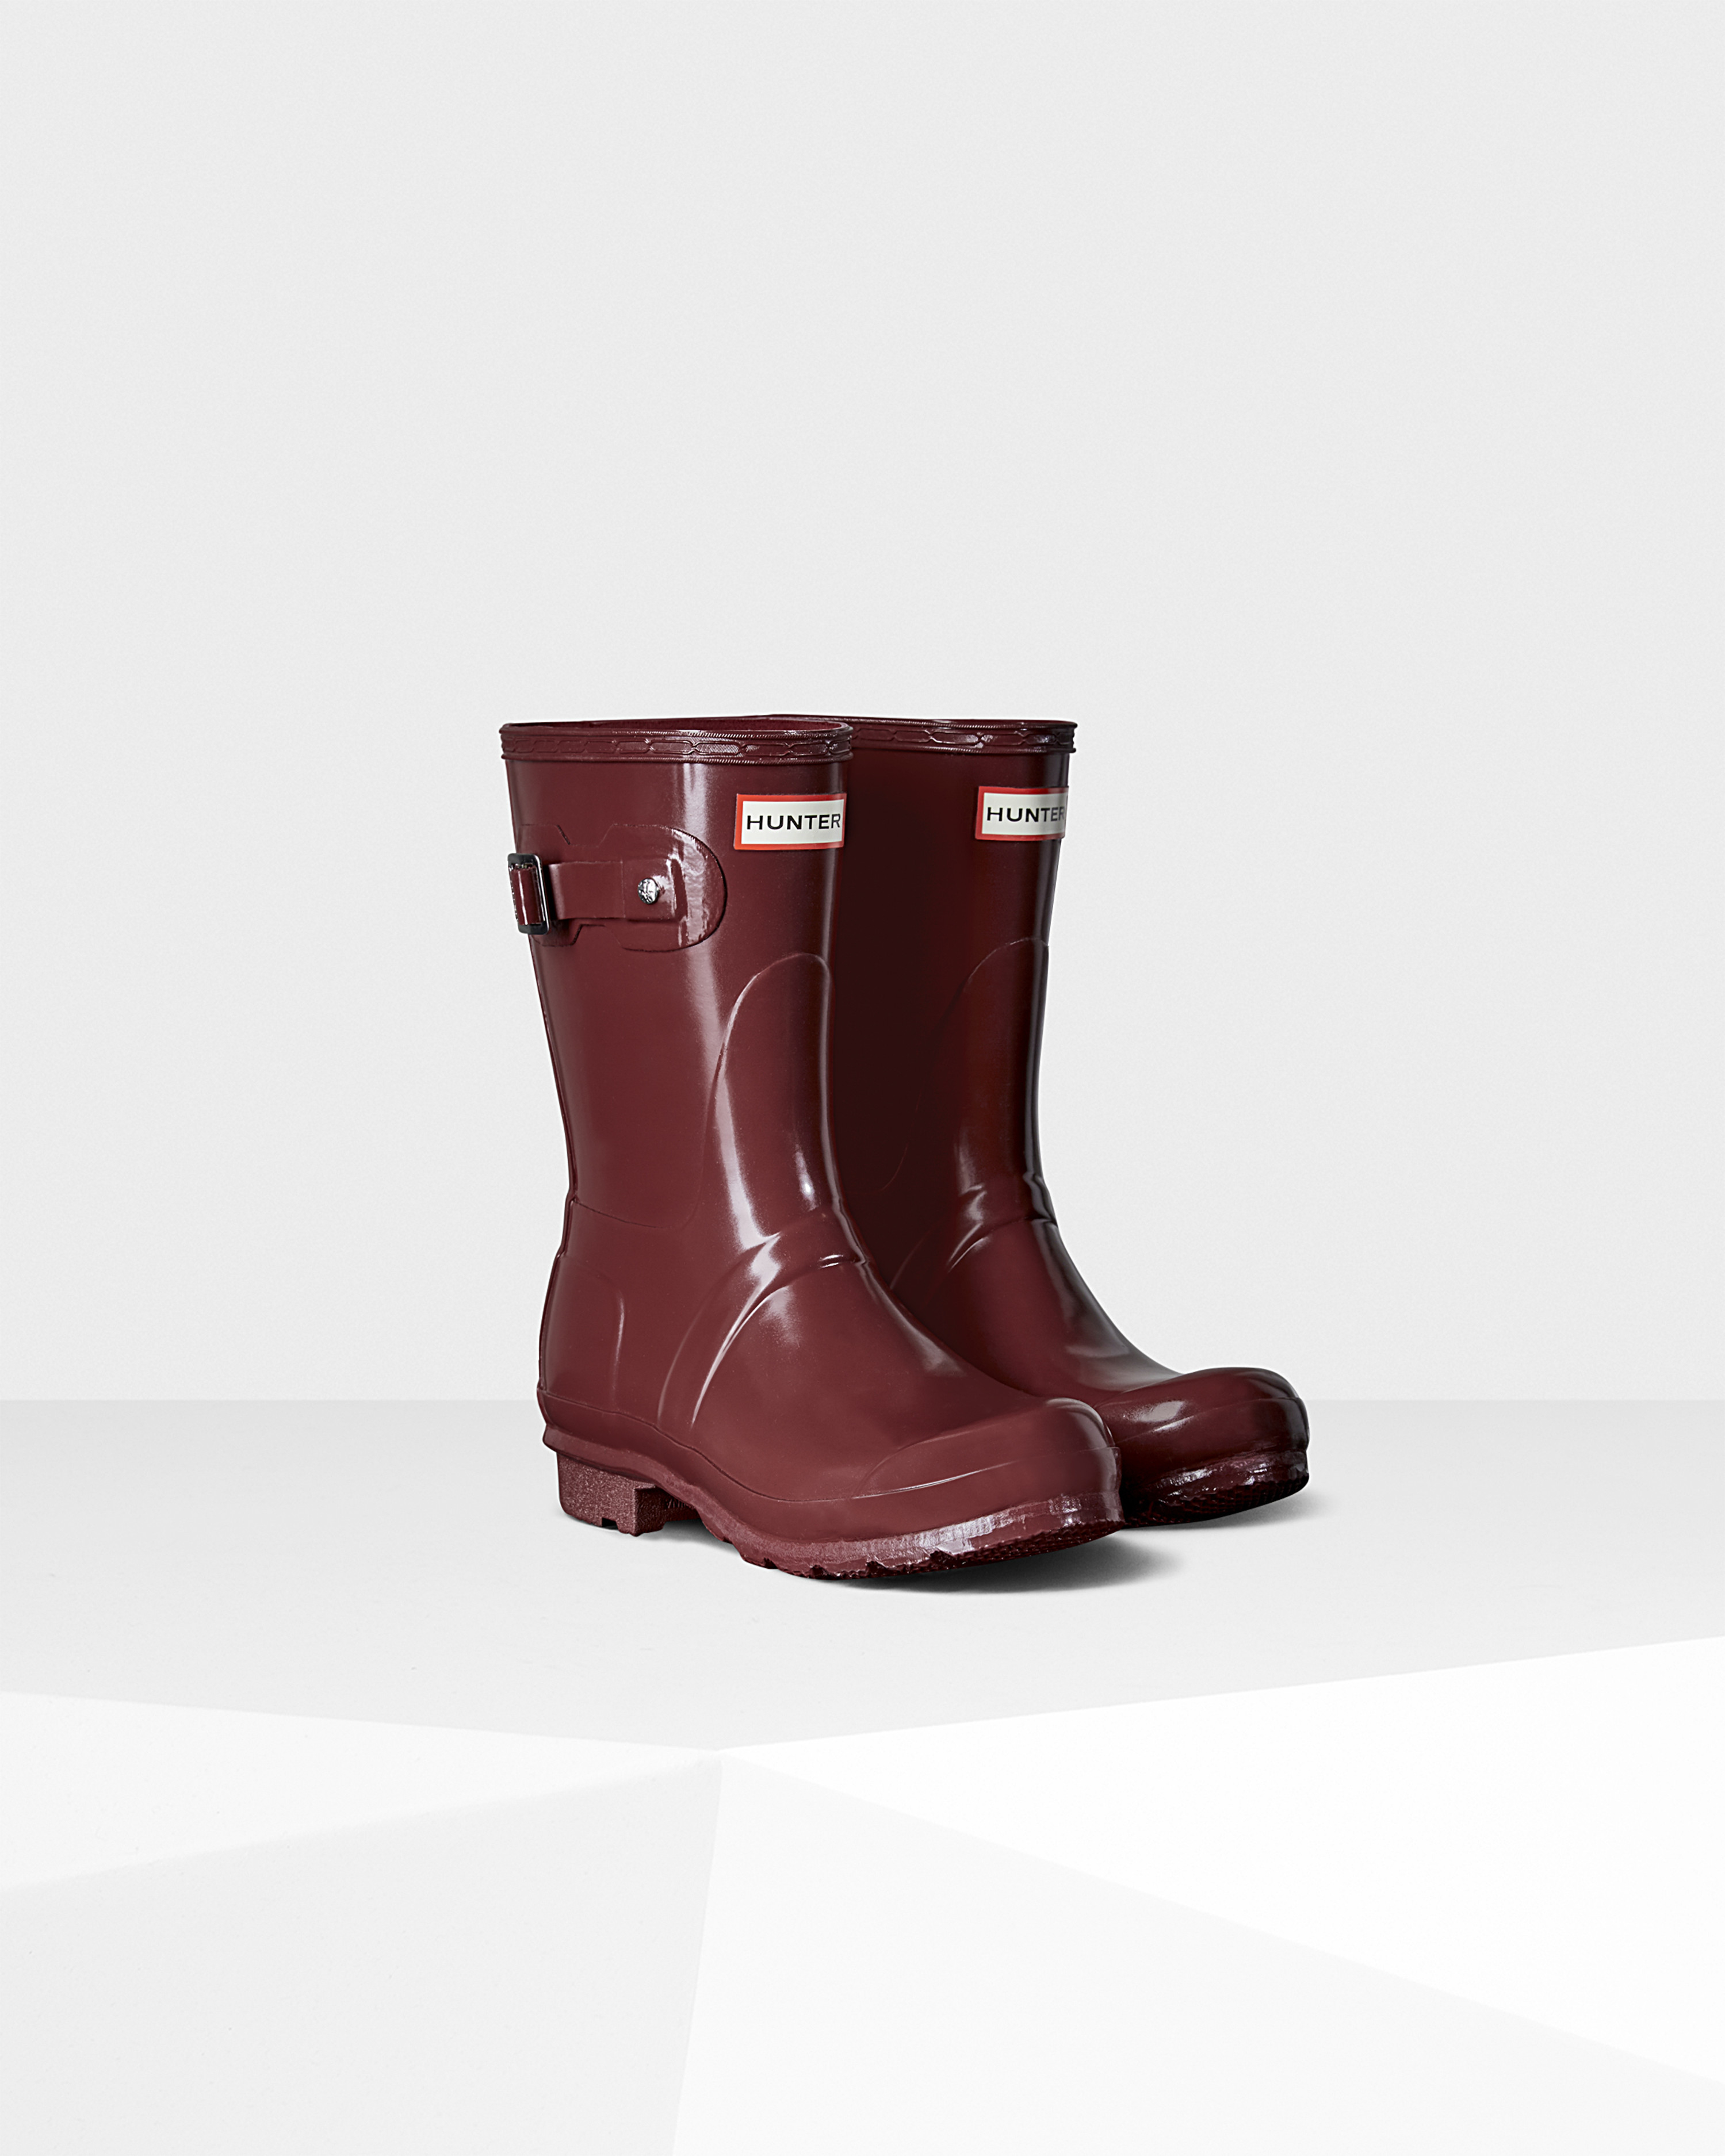 Lyst - Hunter Womens Original Short Gloss Rain Boots In Purple